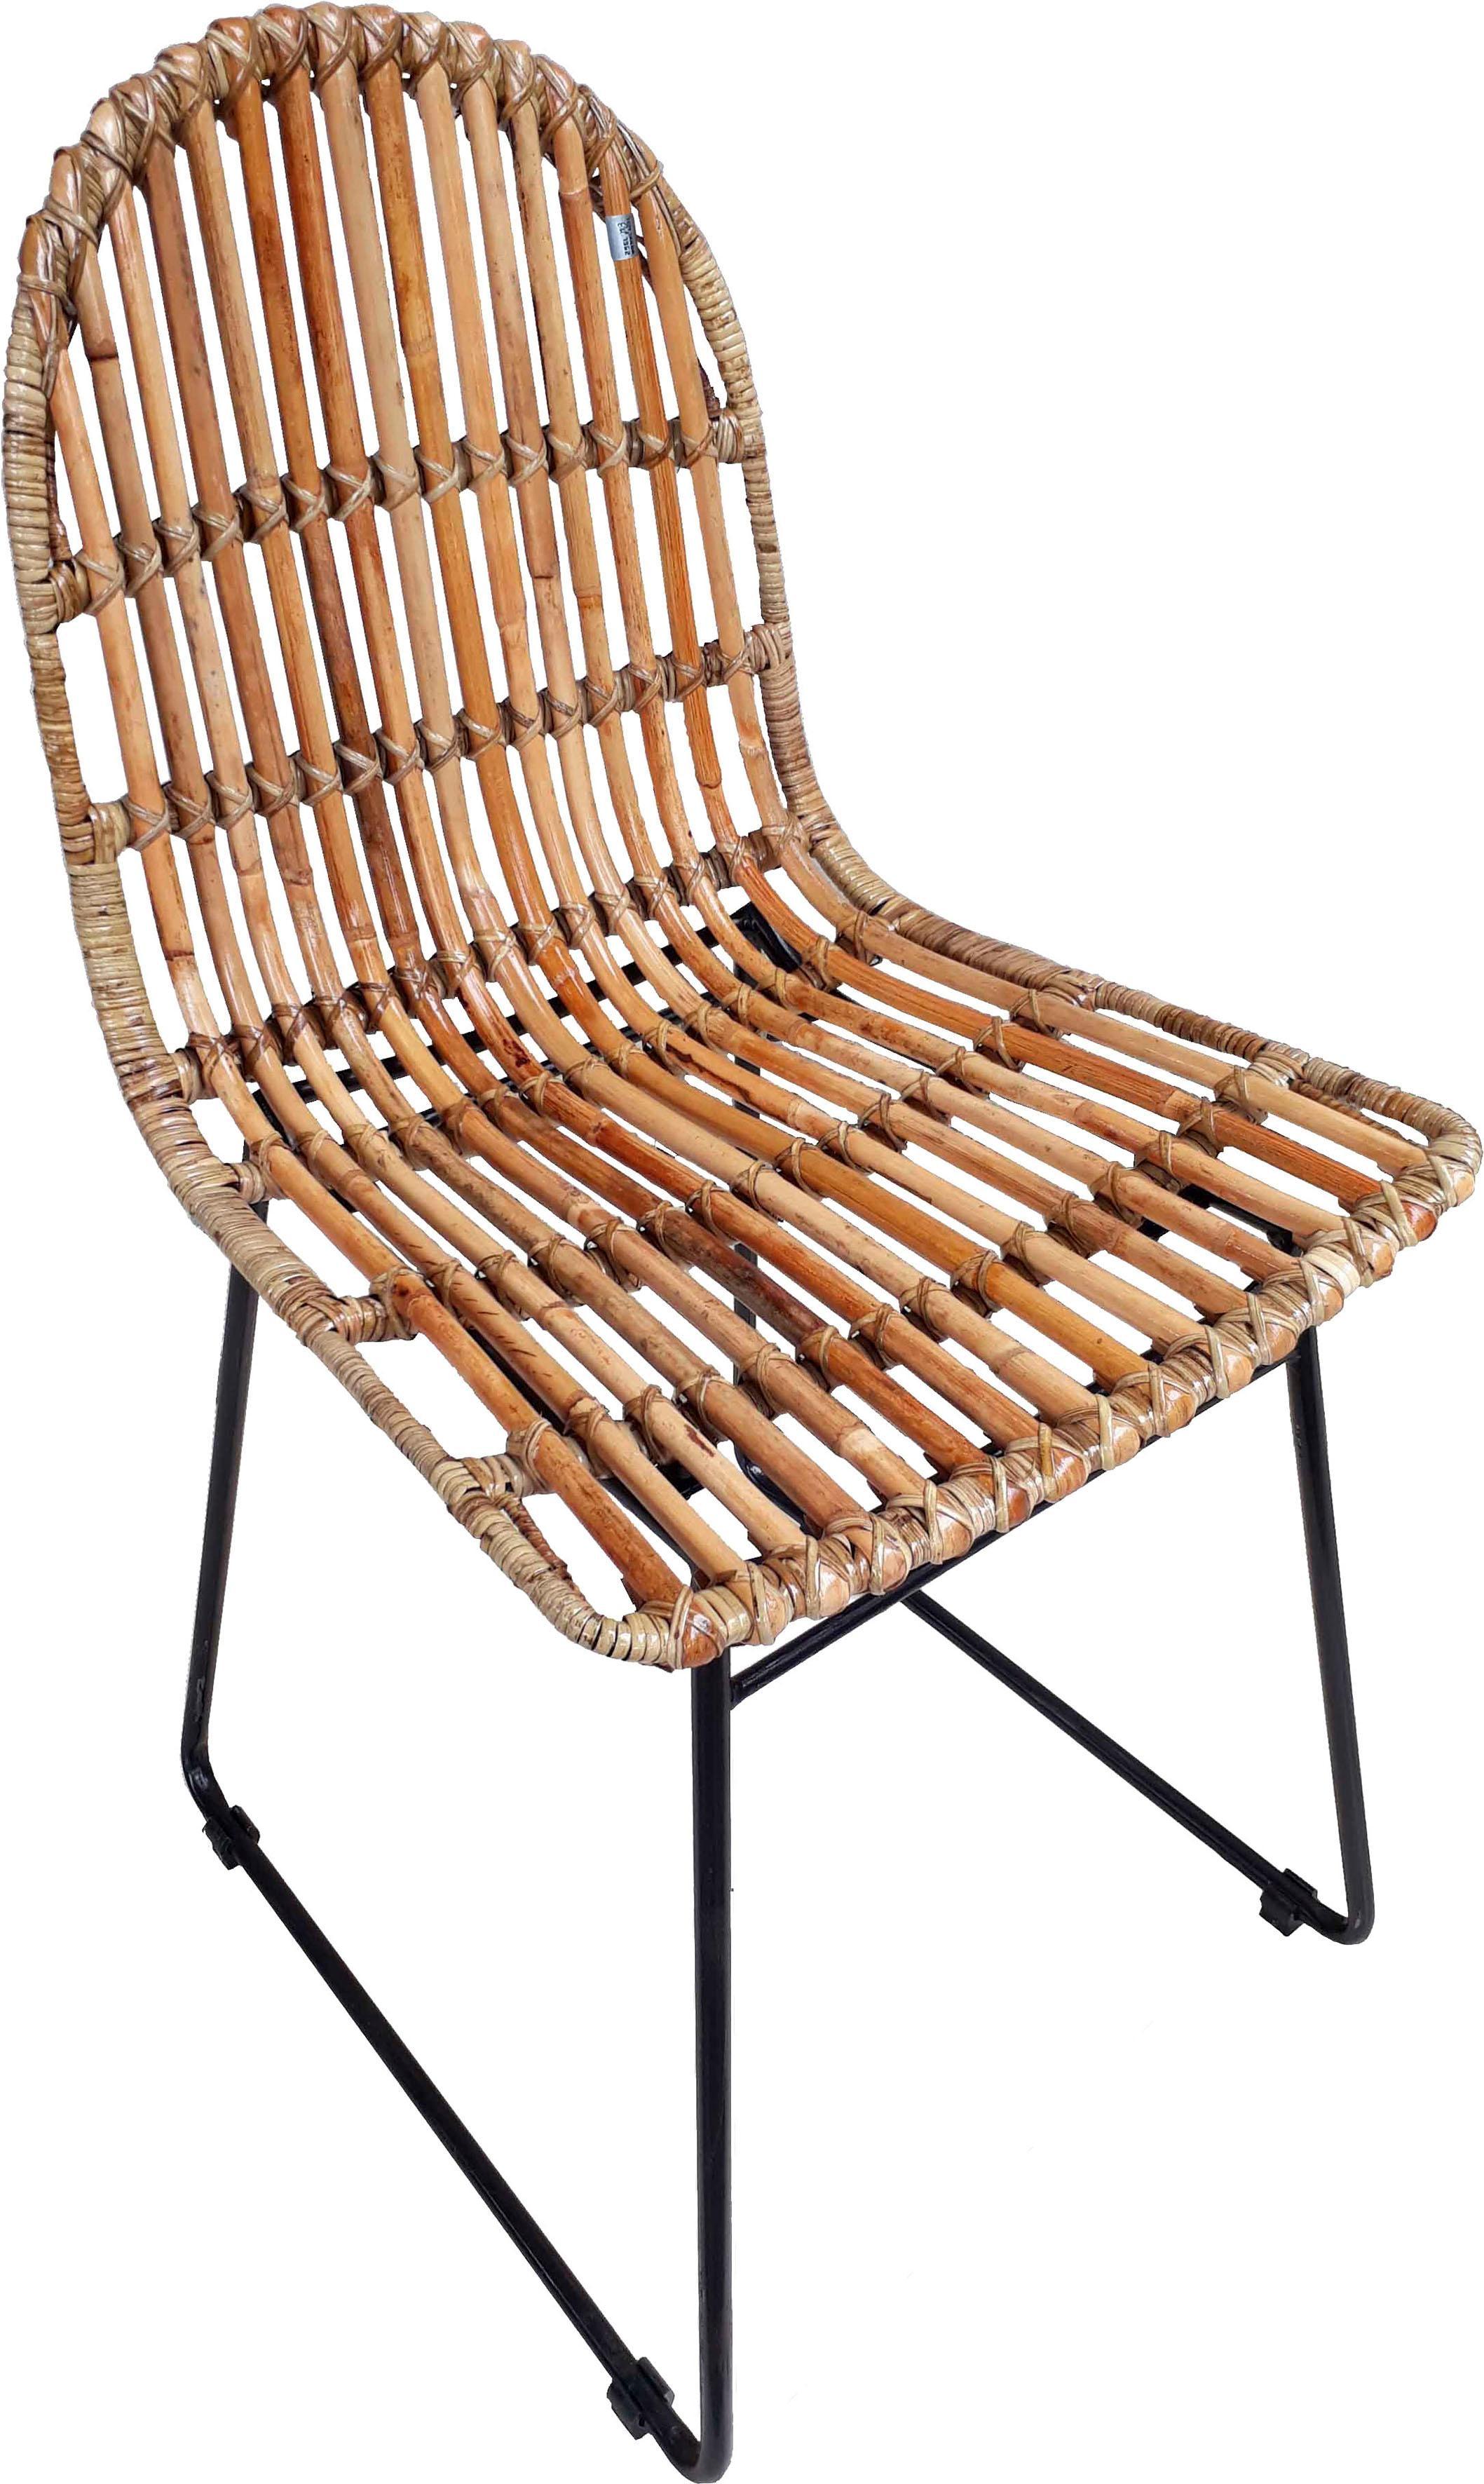 SIT Rattanstuhl Rattan Vintage, im 2er-Set, Shabby Chic, Vintage beige 4-Fuß-Stühle Stühle Sitzbänke